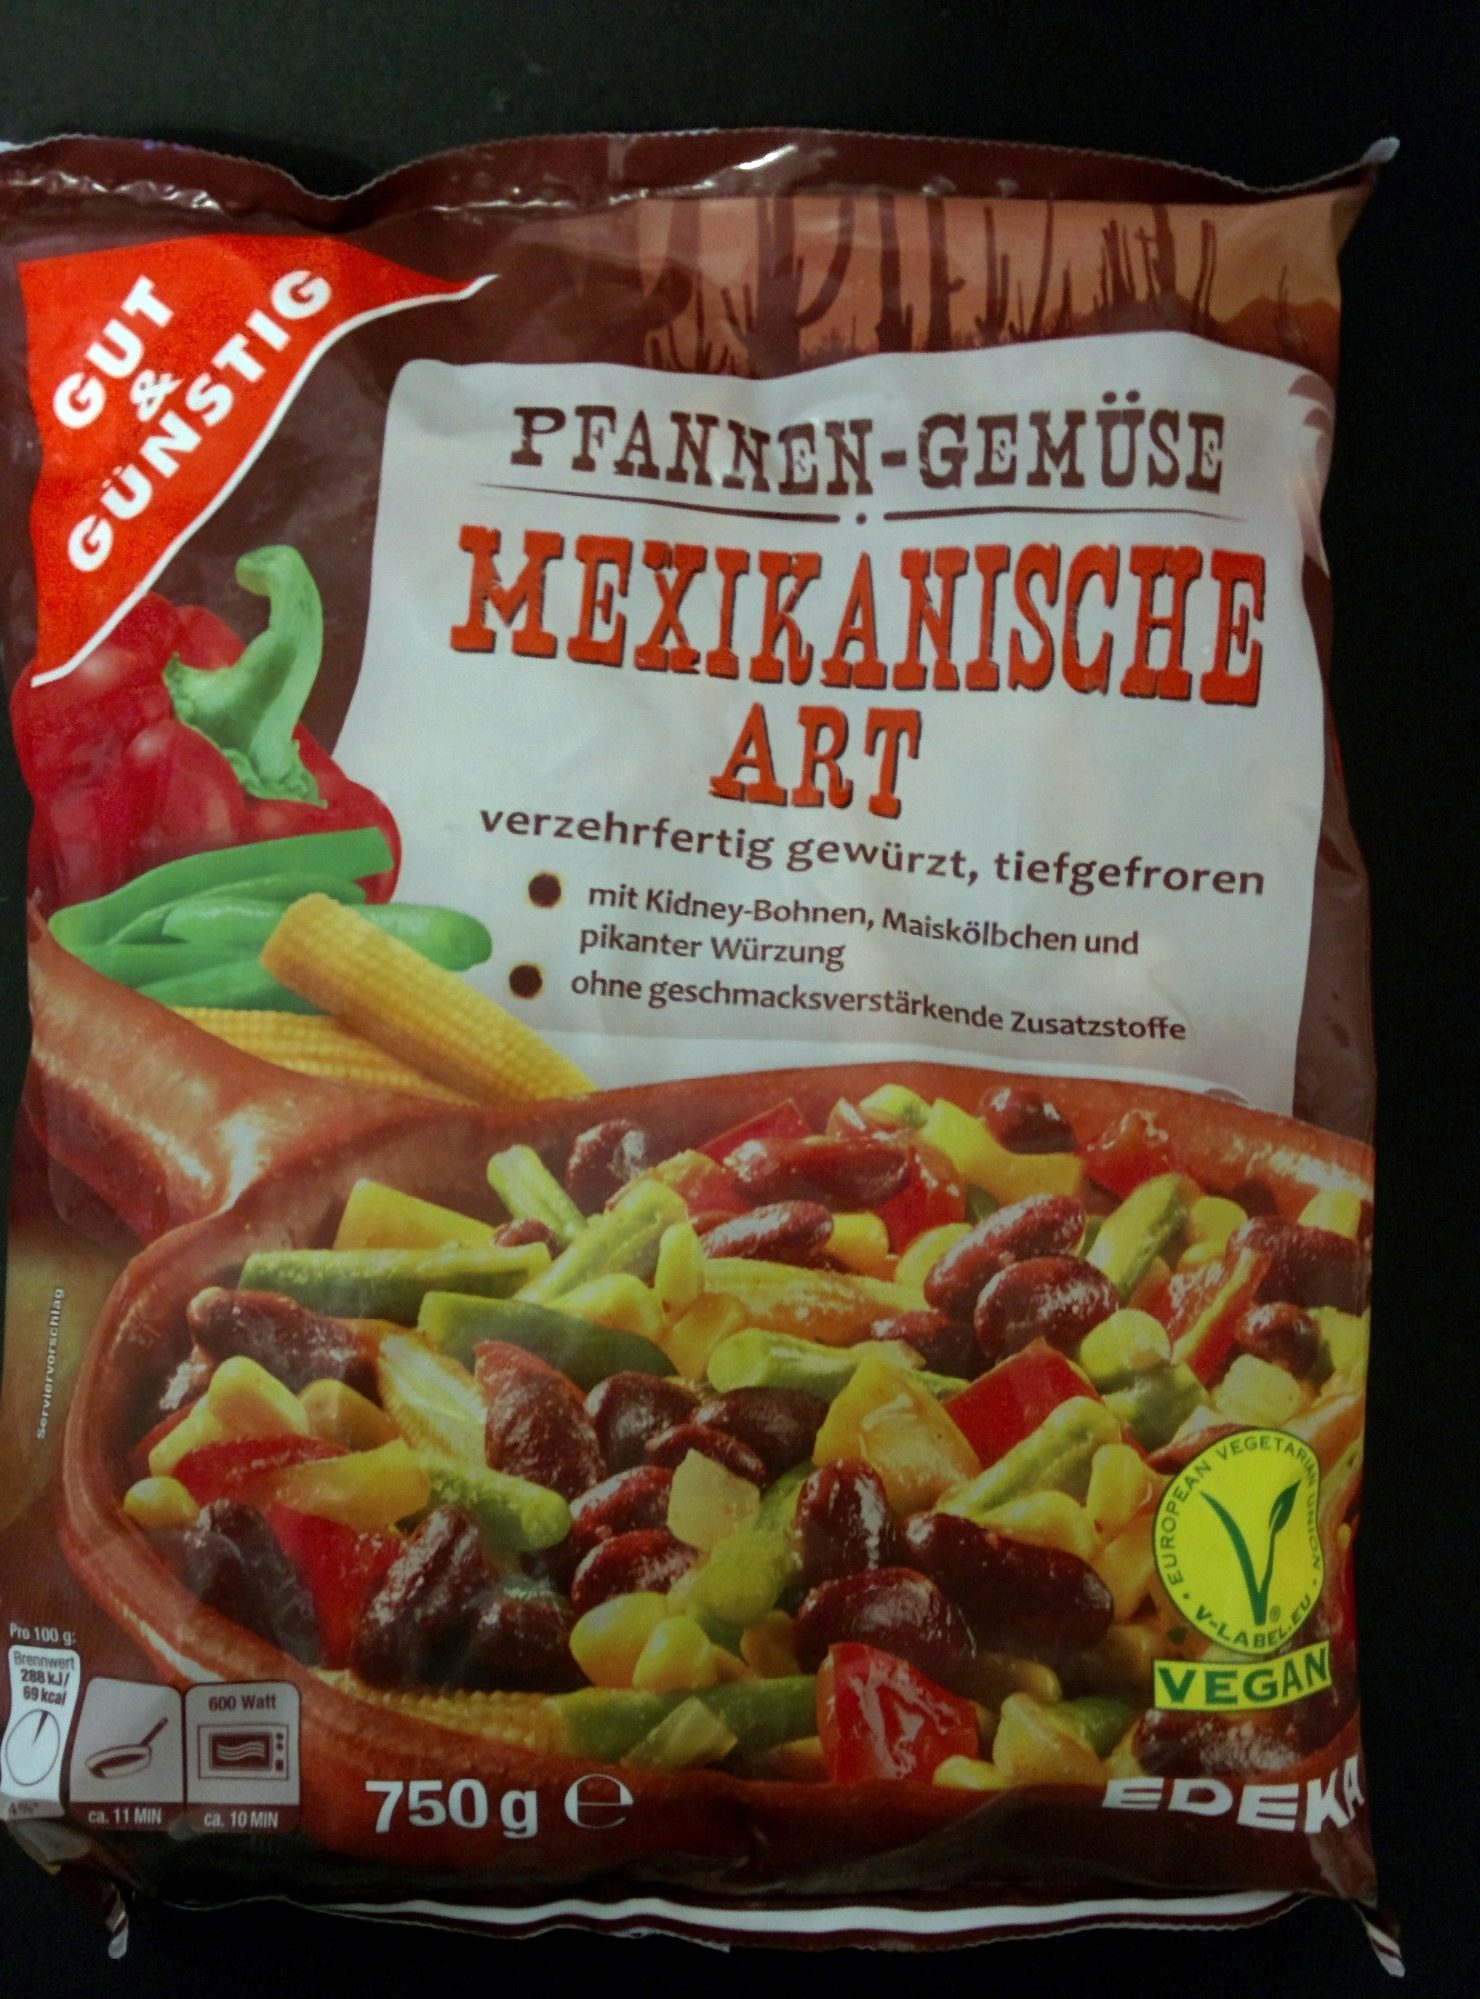 Pfannen-Gemüse mexikanische Art — Gut & Günstig — 750g